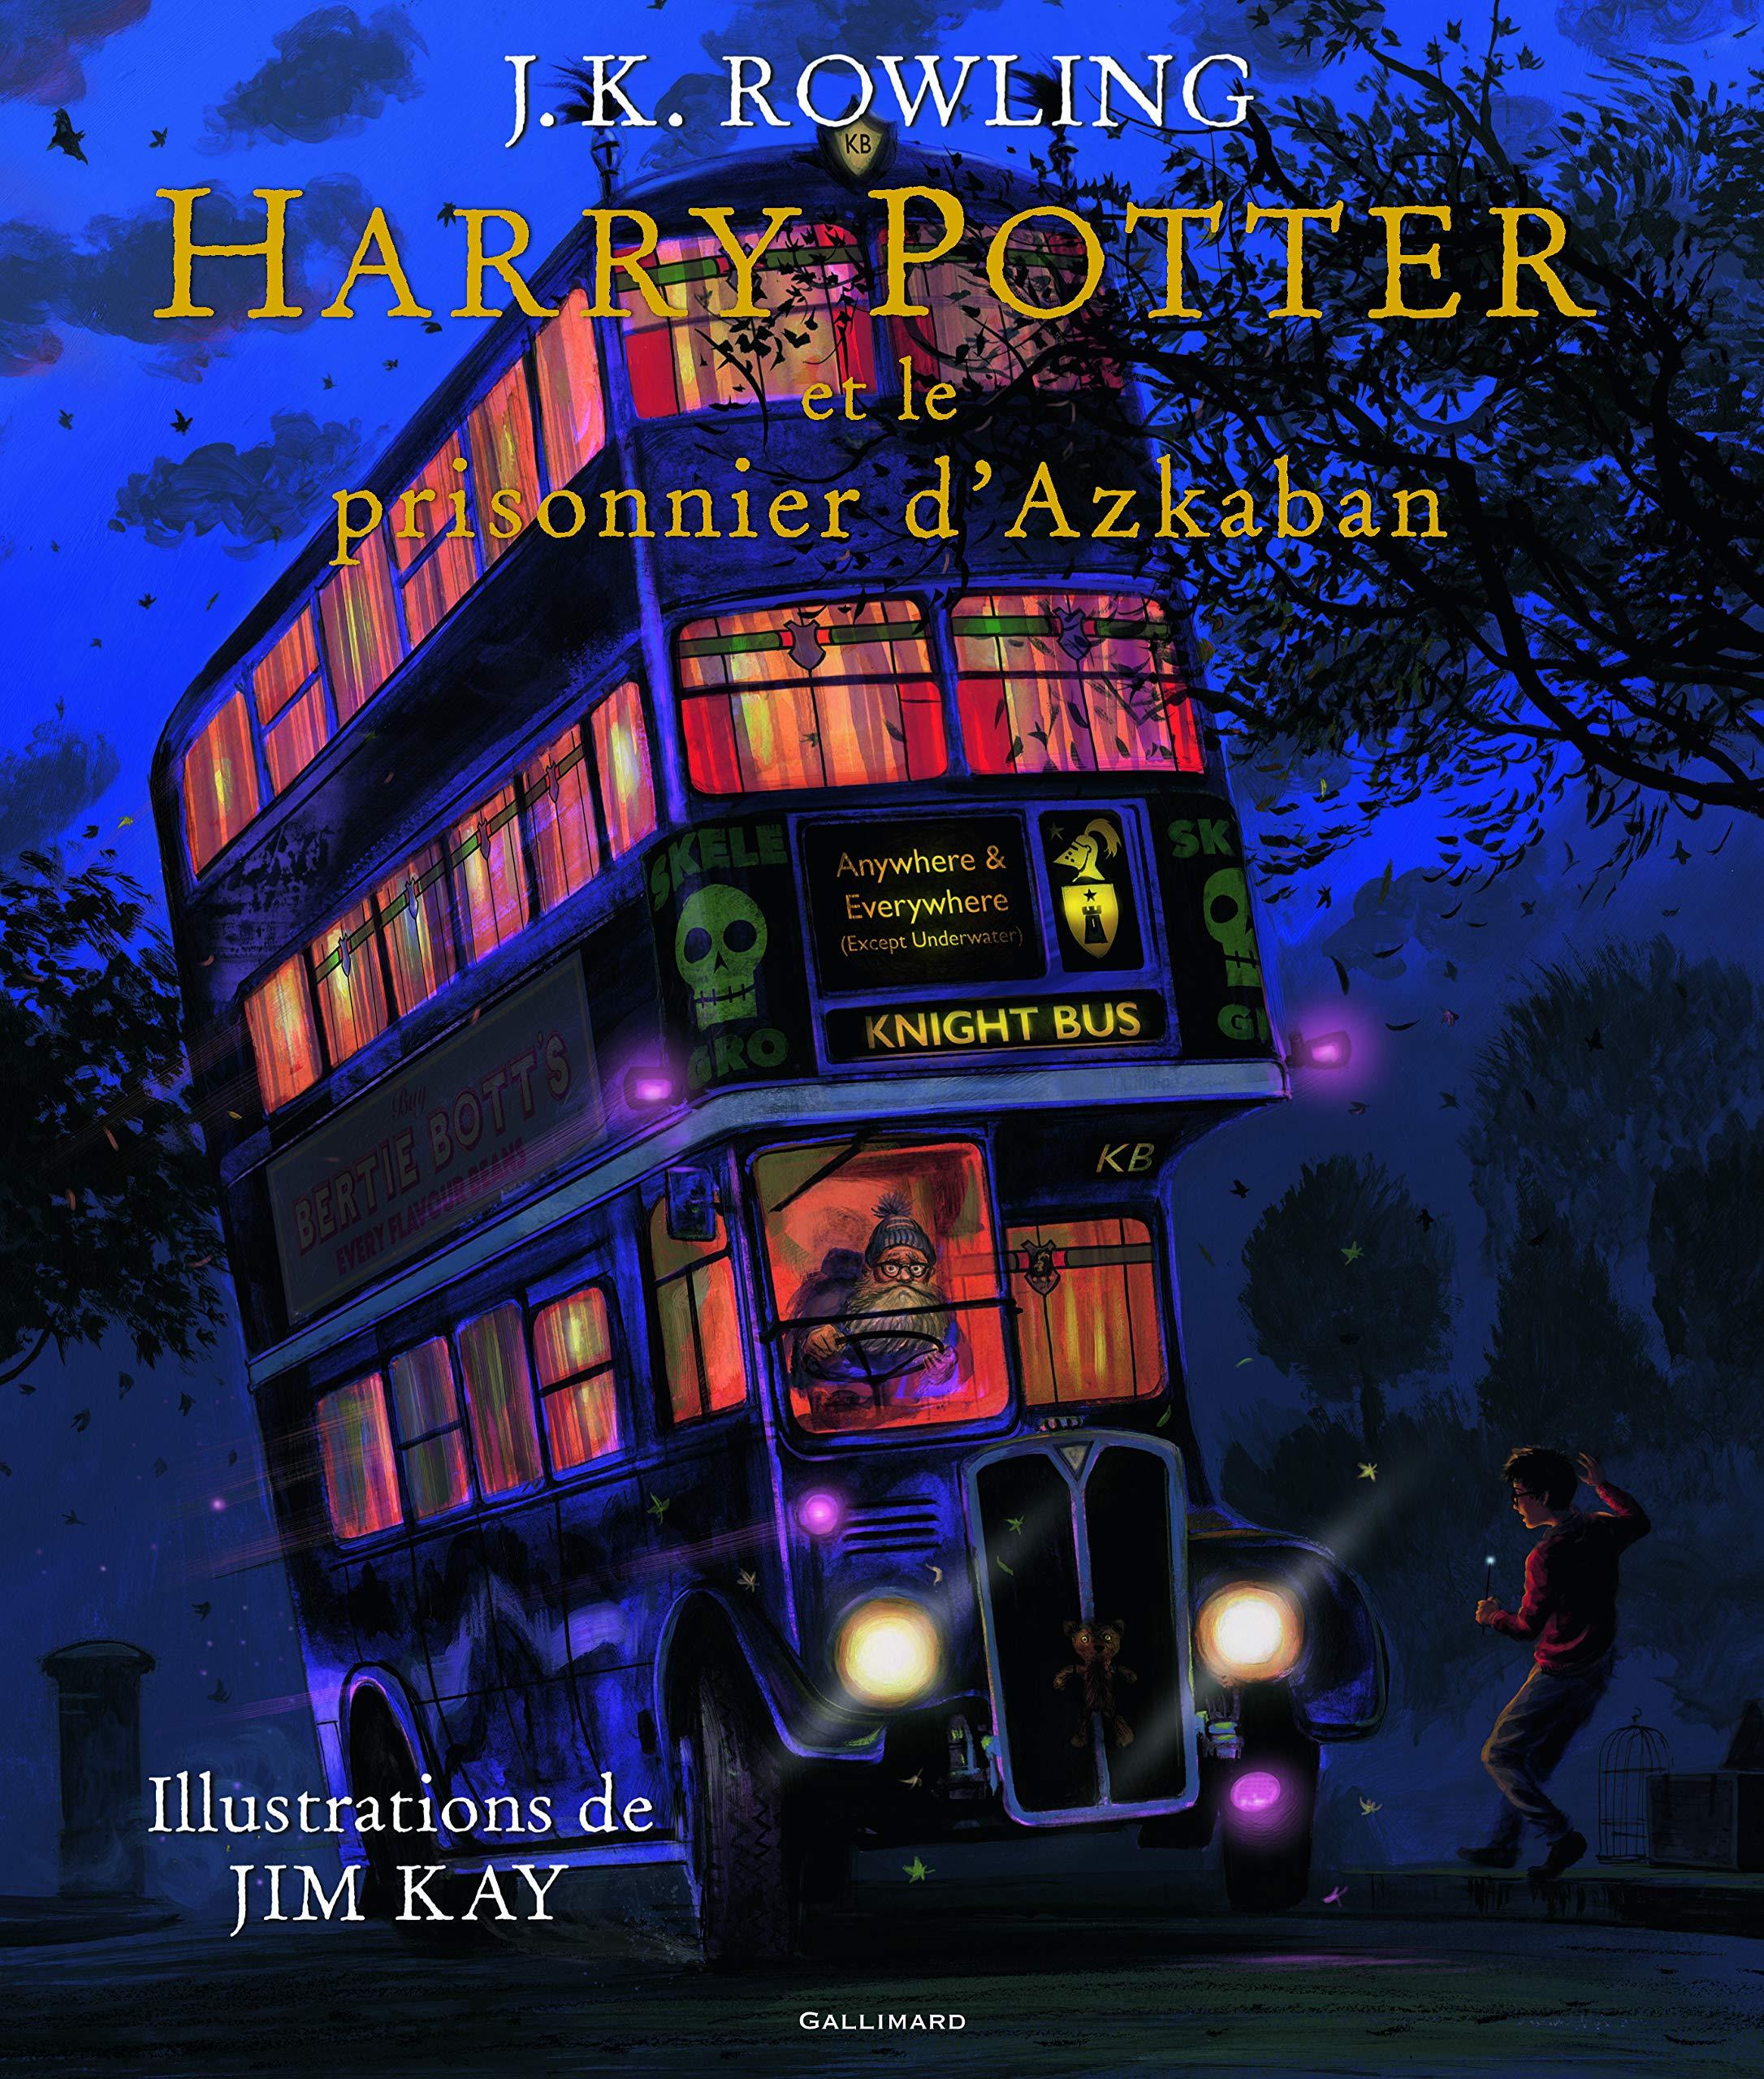 Amazon.fr - Harry Potter, III : Harry Potter et le prisonnier d'Azkaban -  Rowling, J.K., Kay, Jim, Ménard, Jean-François - Livres